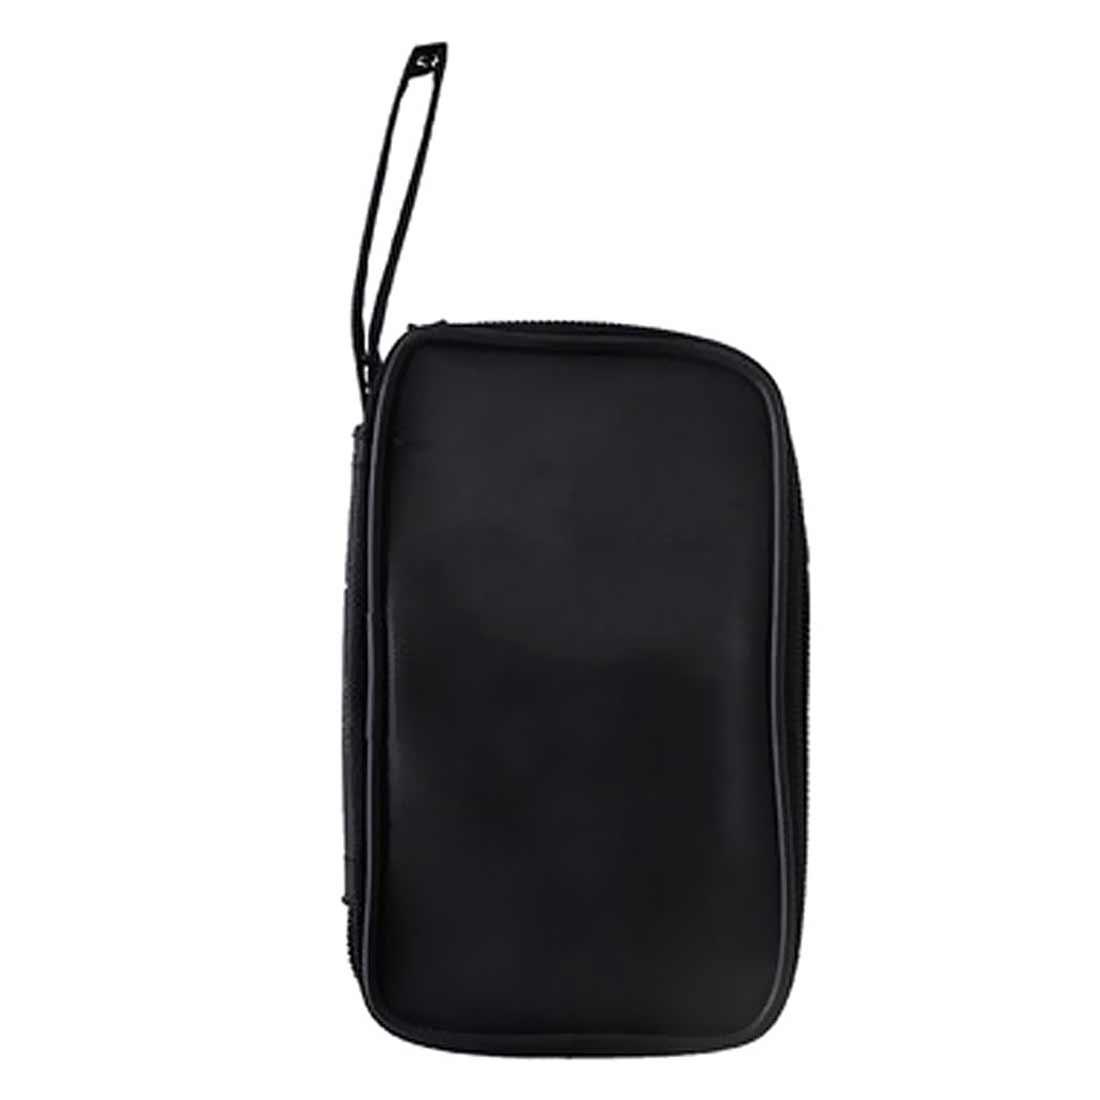 23*14*5cm Tool Bag For Digital Multimeter Tool Kit ELE-B01 Black Multi-purpose Tool Bag Nylon Pouch